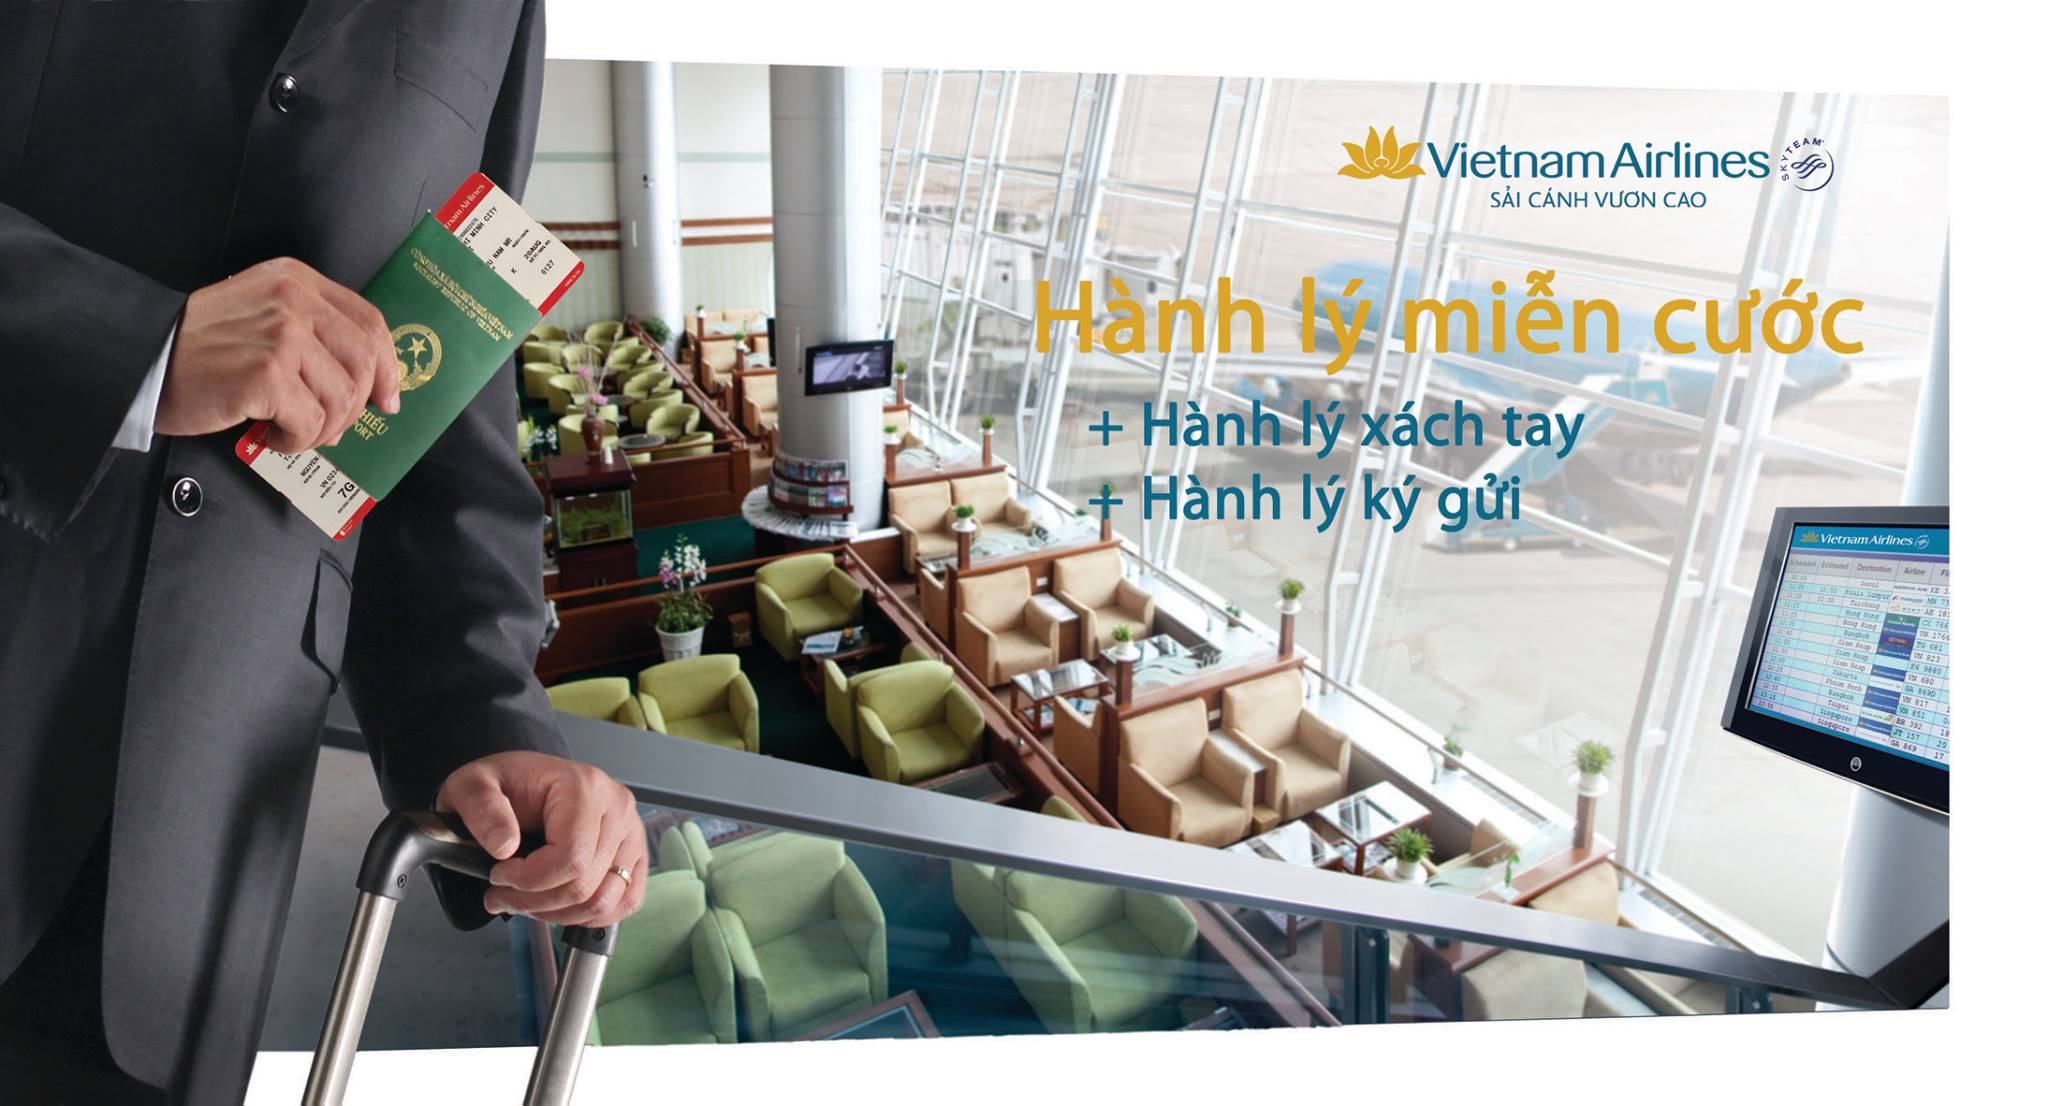 hanh ly mien cuoc cua vietnam airline